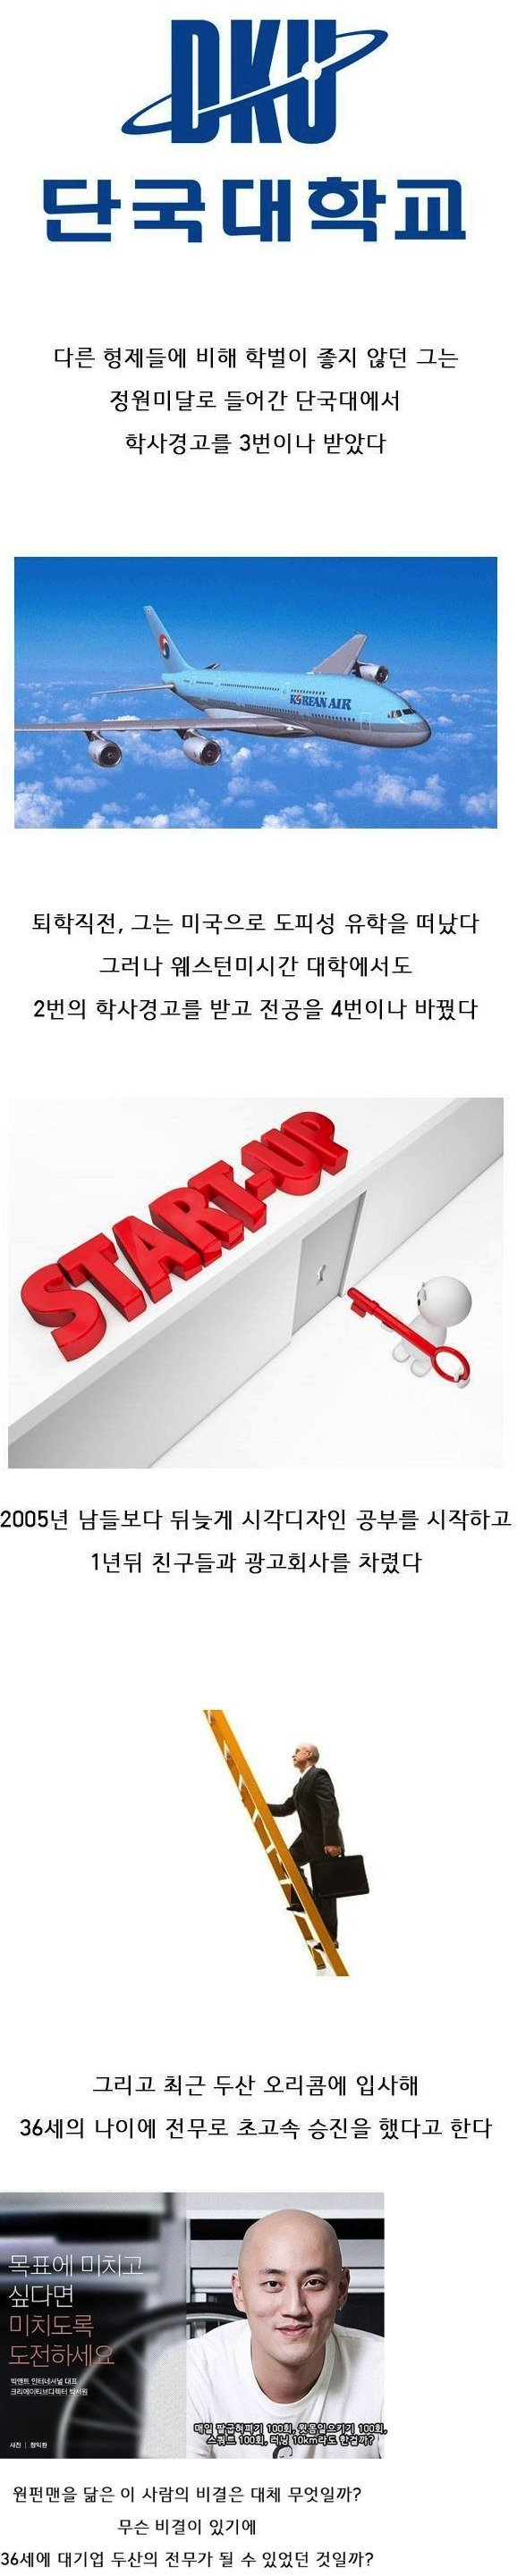 viewimage.php?id=3eb4de21e9d73ab360b8dab04785736f&no=24b0d769e1d32ca73deb86fa11d02831d16706cea37200d6da918d798472dc634d6bb47b43d8cb3130c97290265bbd2da63aebf185190ac781f6855bbfd0f49194e1e8472eacee29e47e685ea2c477b6ab3497d0d3bf3cddacd3ae4483e0b0e40839b7b0c5a9c4dcfe931227